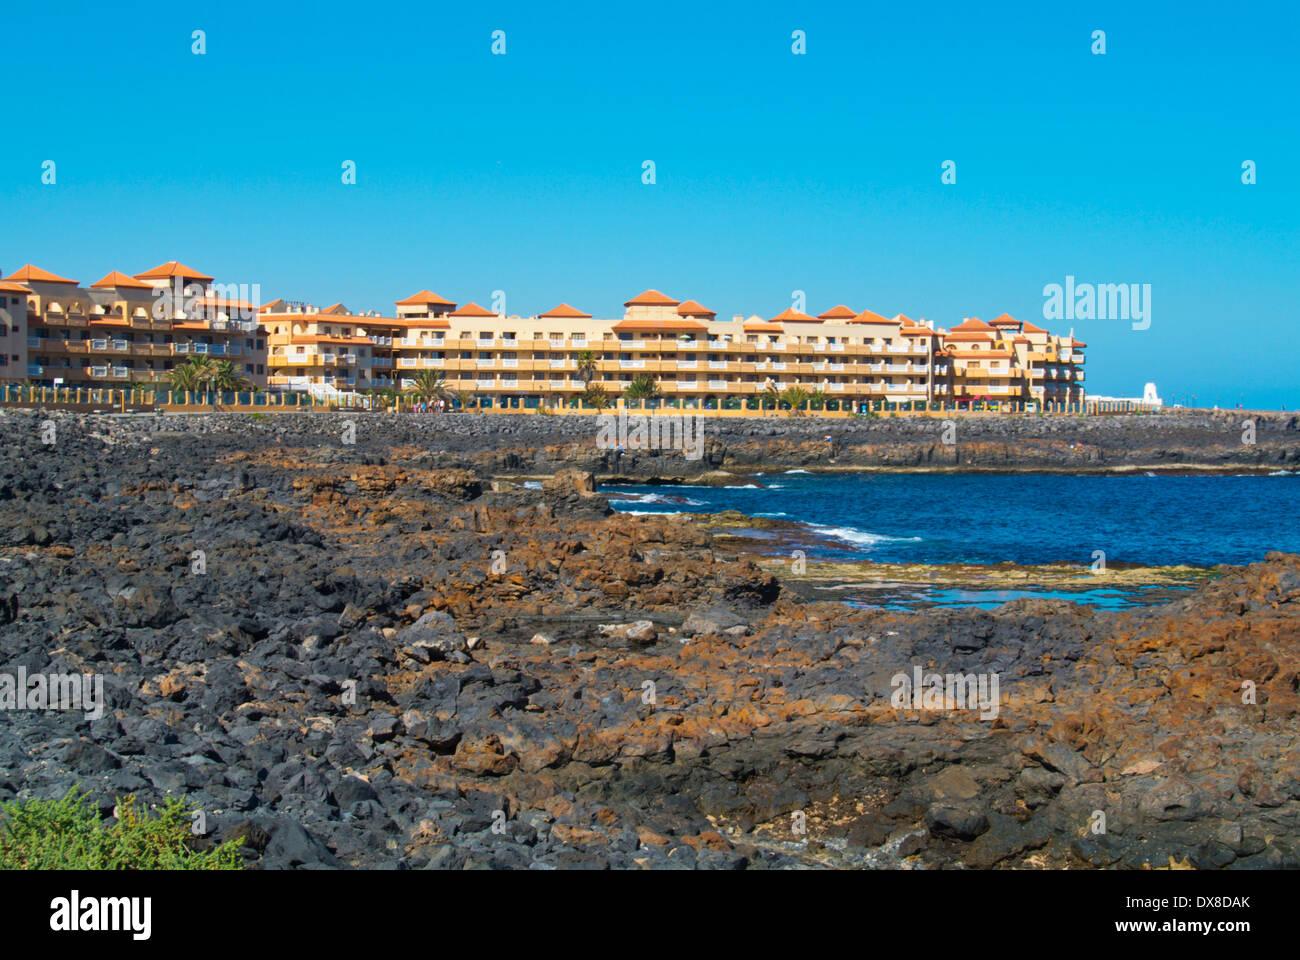 Hotel Castillo Beach Canaries